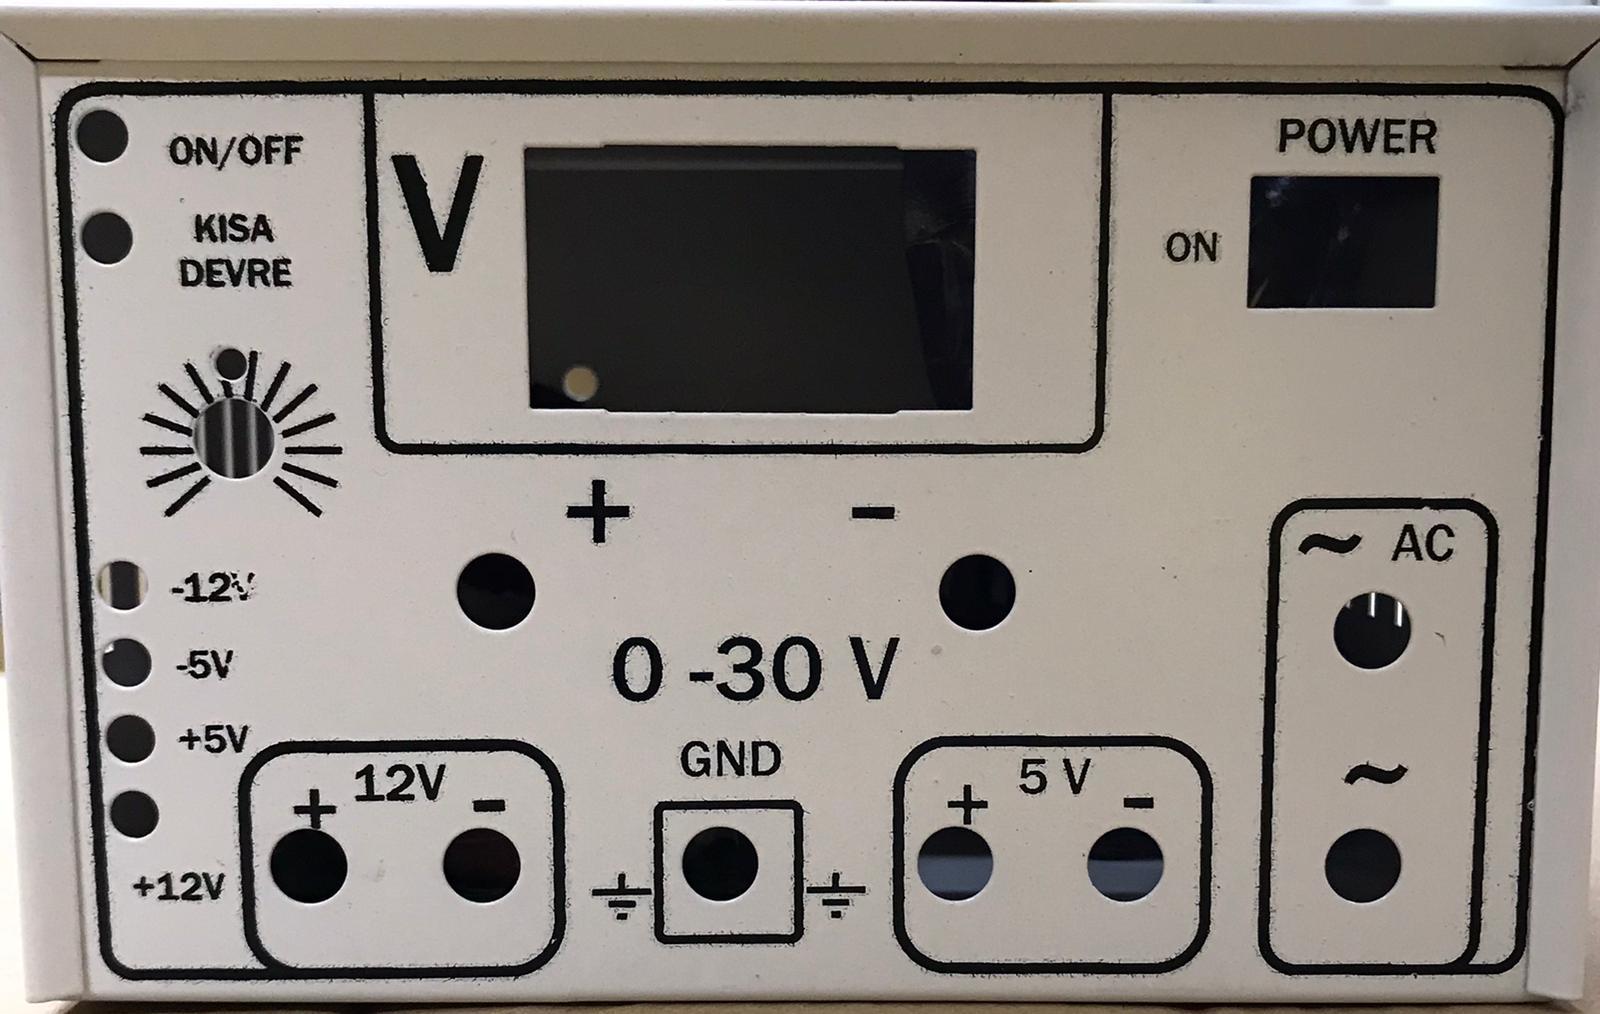 0 - 30V Ayarlı Demonte Güç Kaynağı (Simetrik besleme +/- 12V ve +/- 5V ile) resmi 2